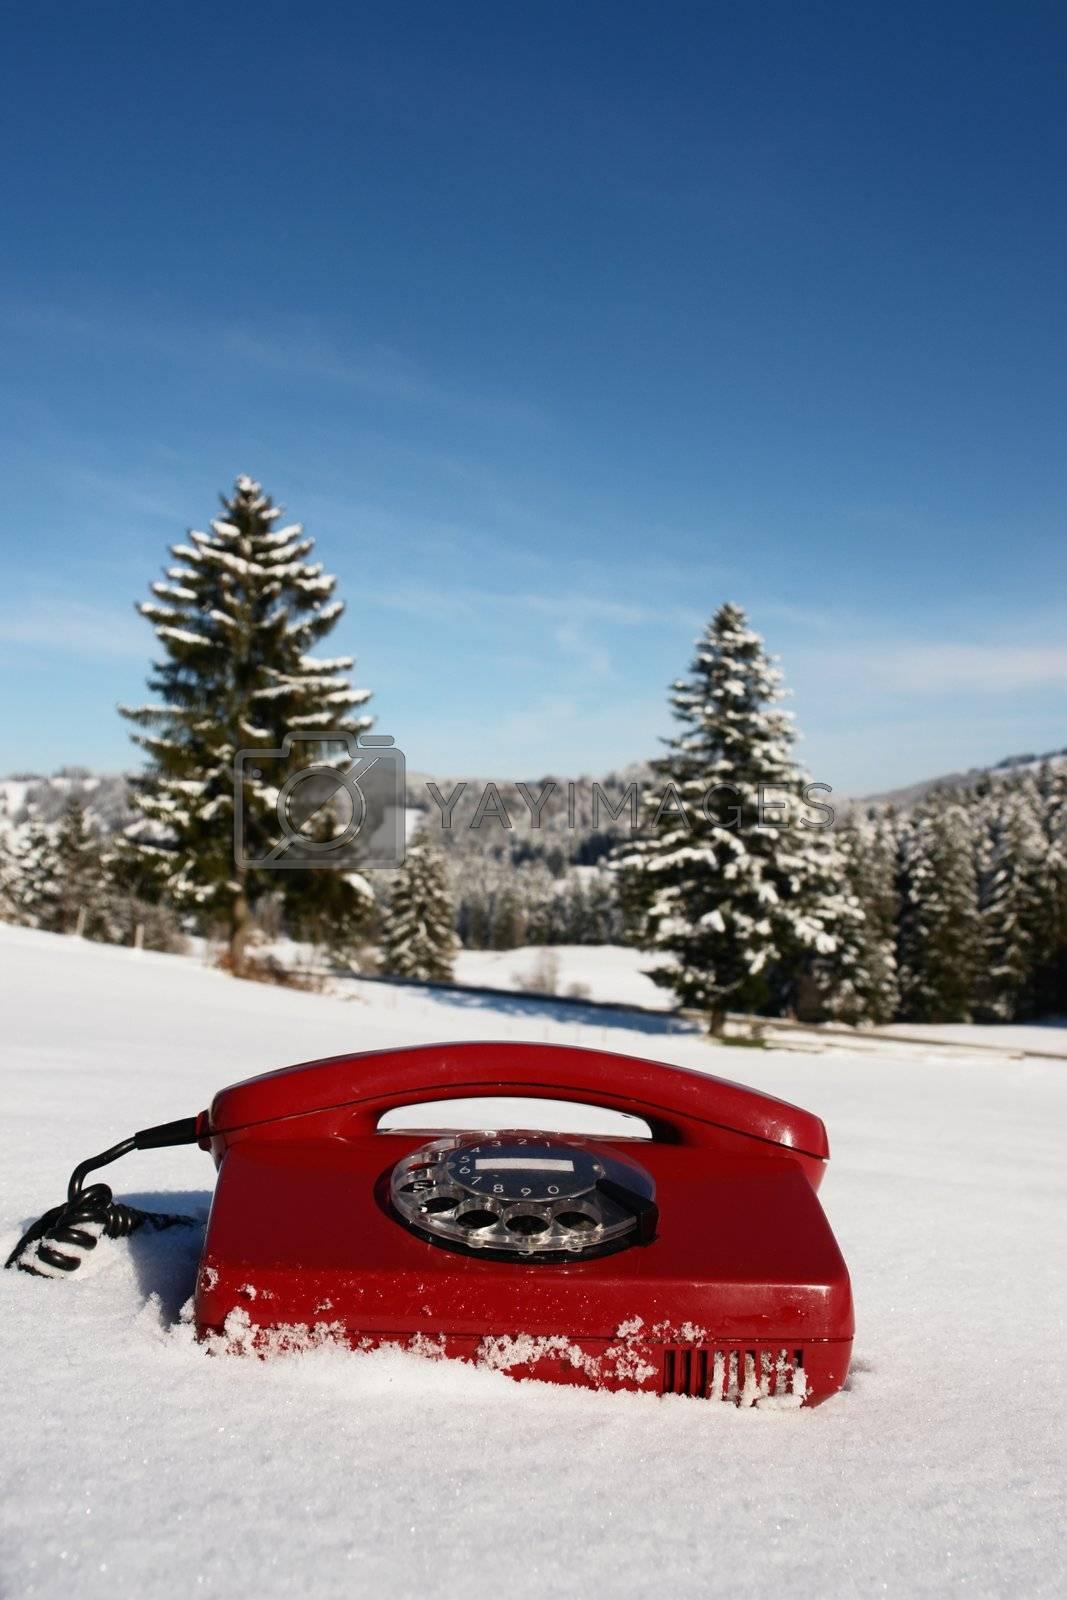 Santa Claus Hotline symbolized by a red retro phone